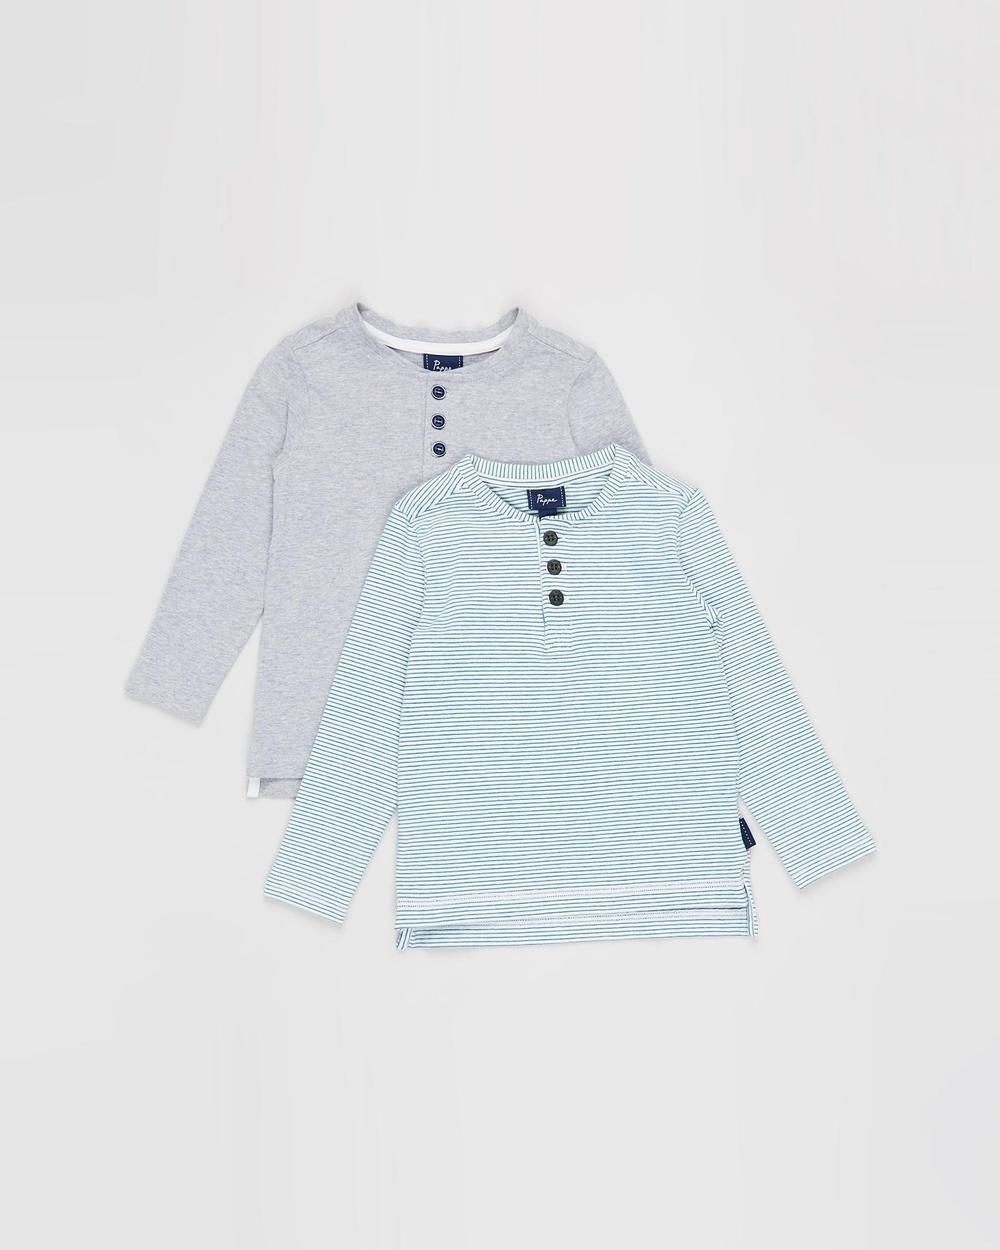 Pappe 2 Pack Croft Henley LS T Shirt Babies Kids T-Shirts & Singlets Grey Corsair Stripe 2-Pack T-Shirt Babies-Kids Australia